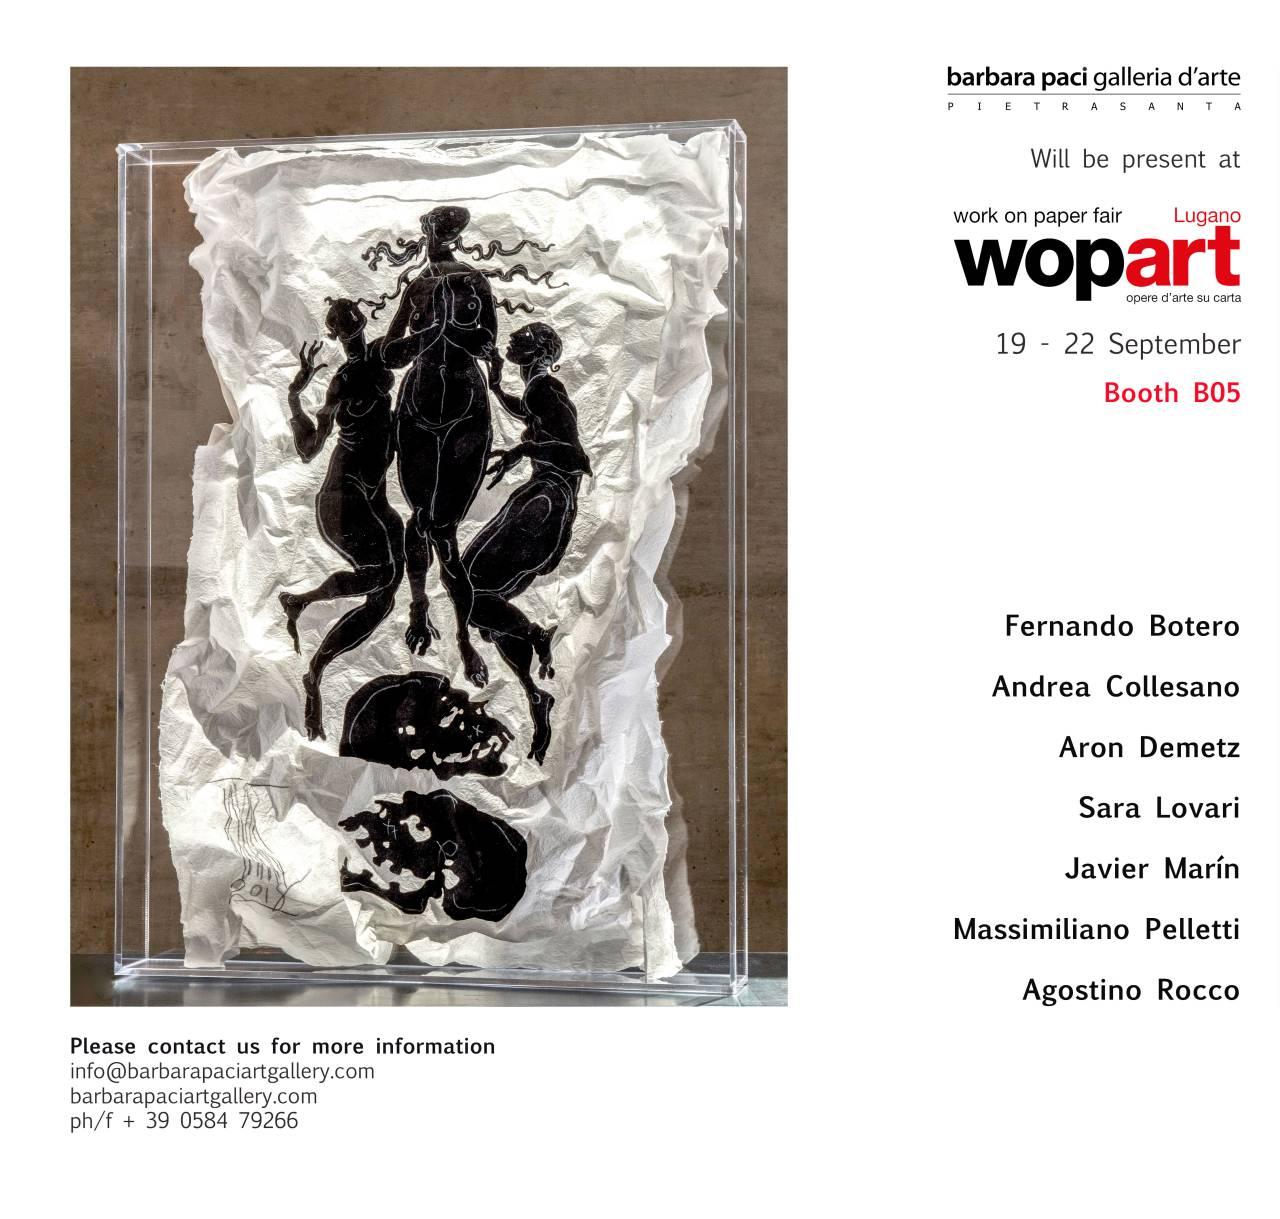 Wopart Art Fair - Lugano | Settembre 2019